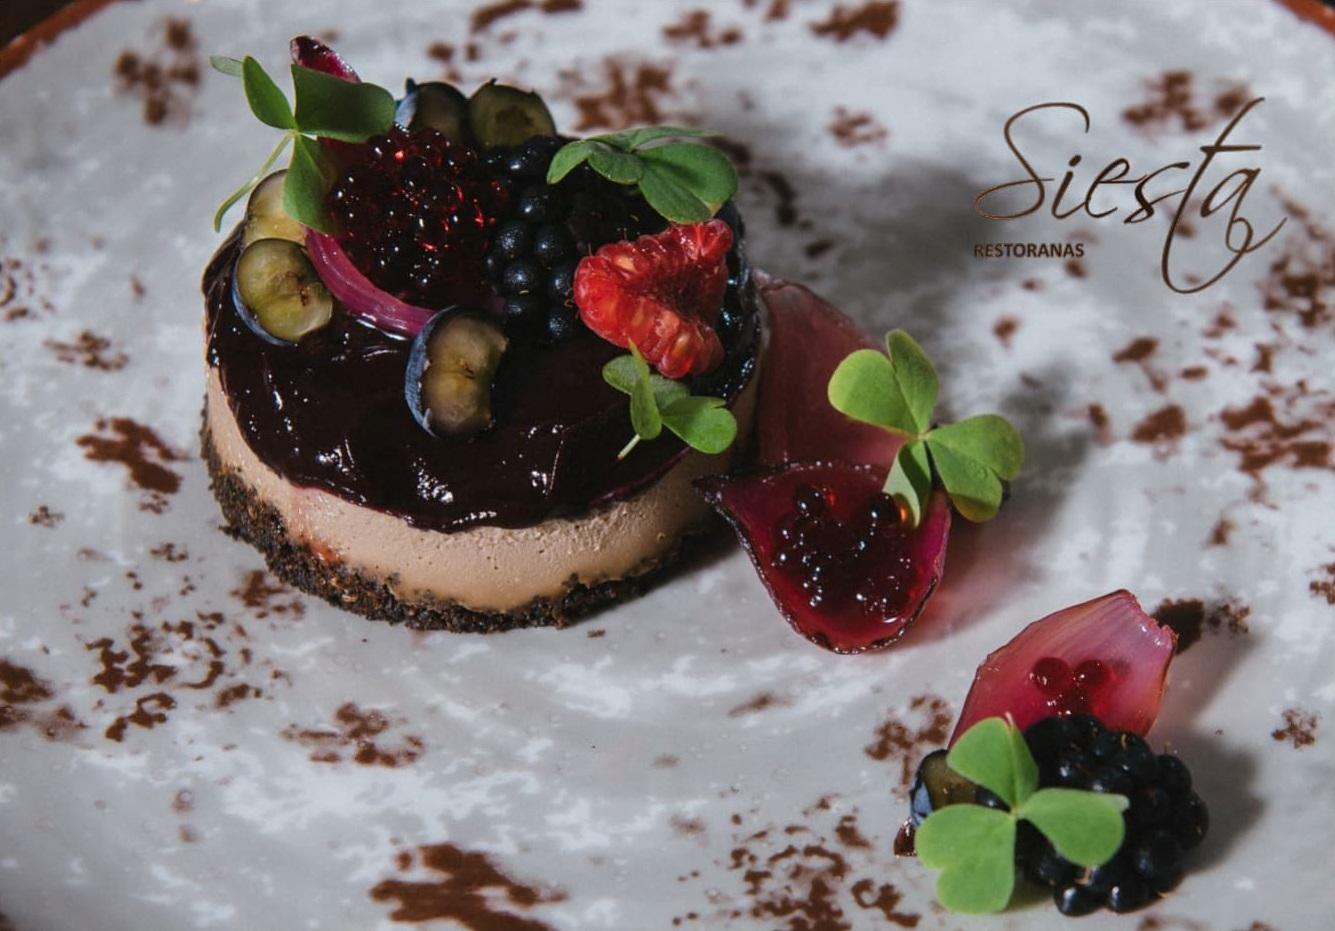 Specialus rudens pasiūlymas restoranas Siesta